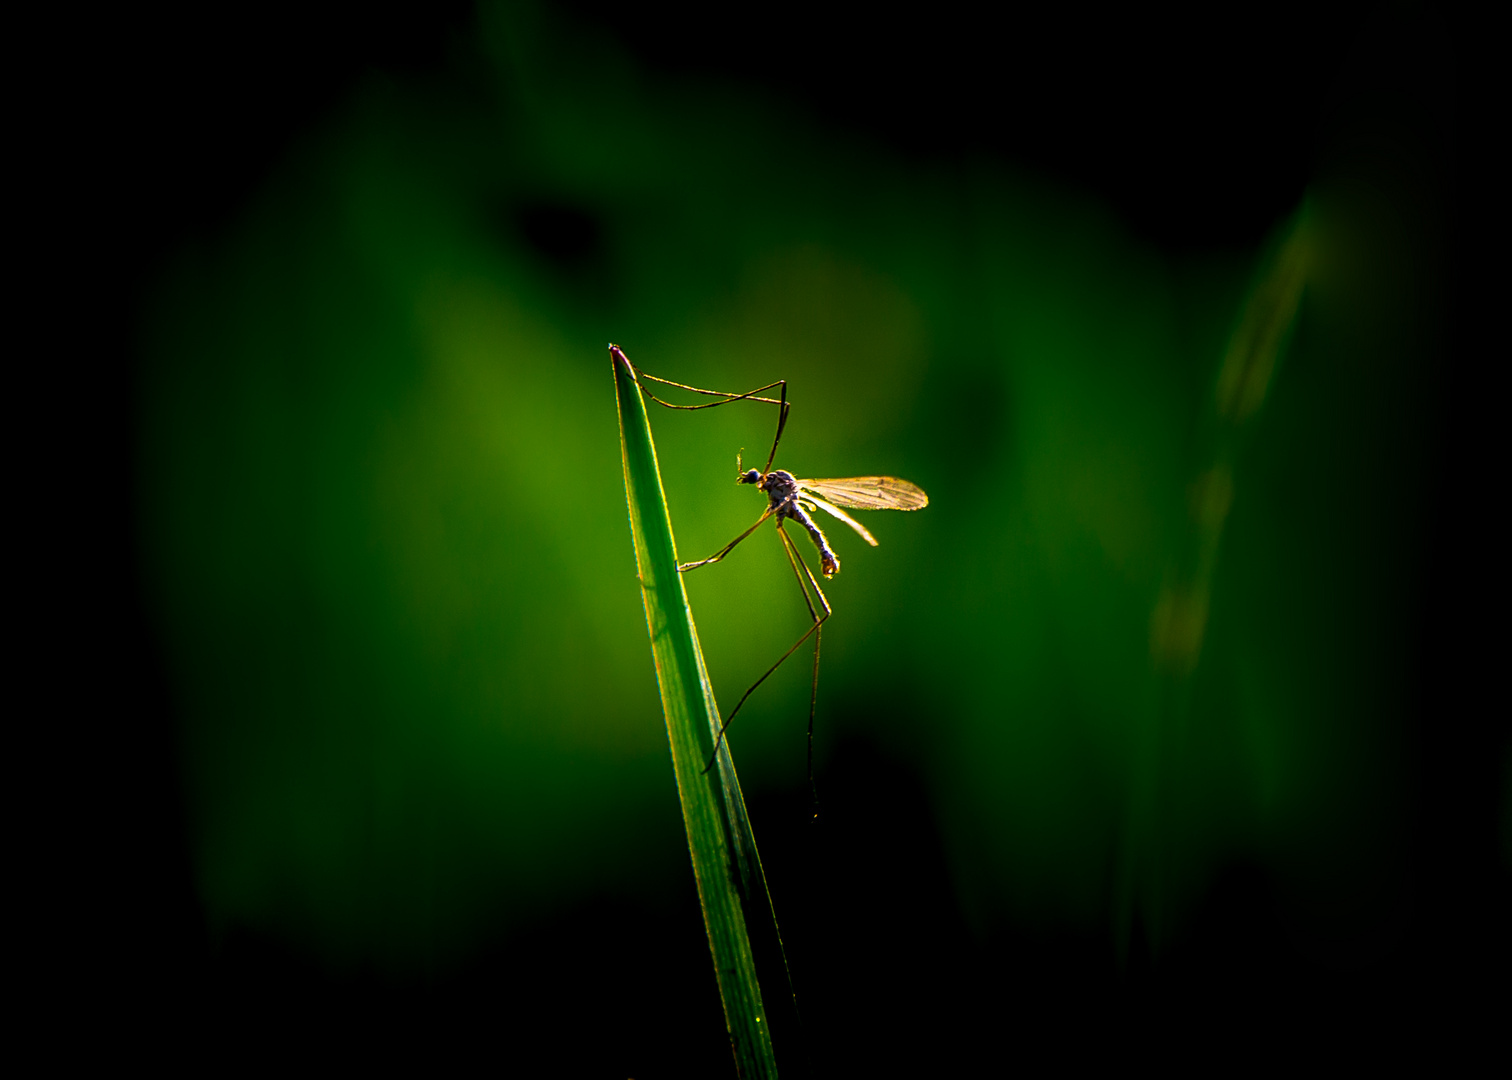 Green Mosquito